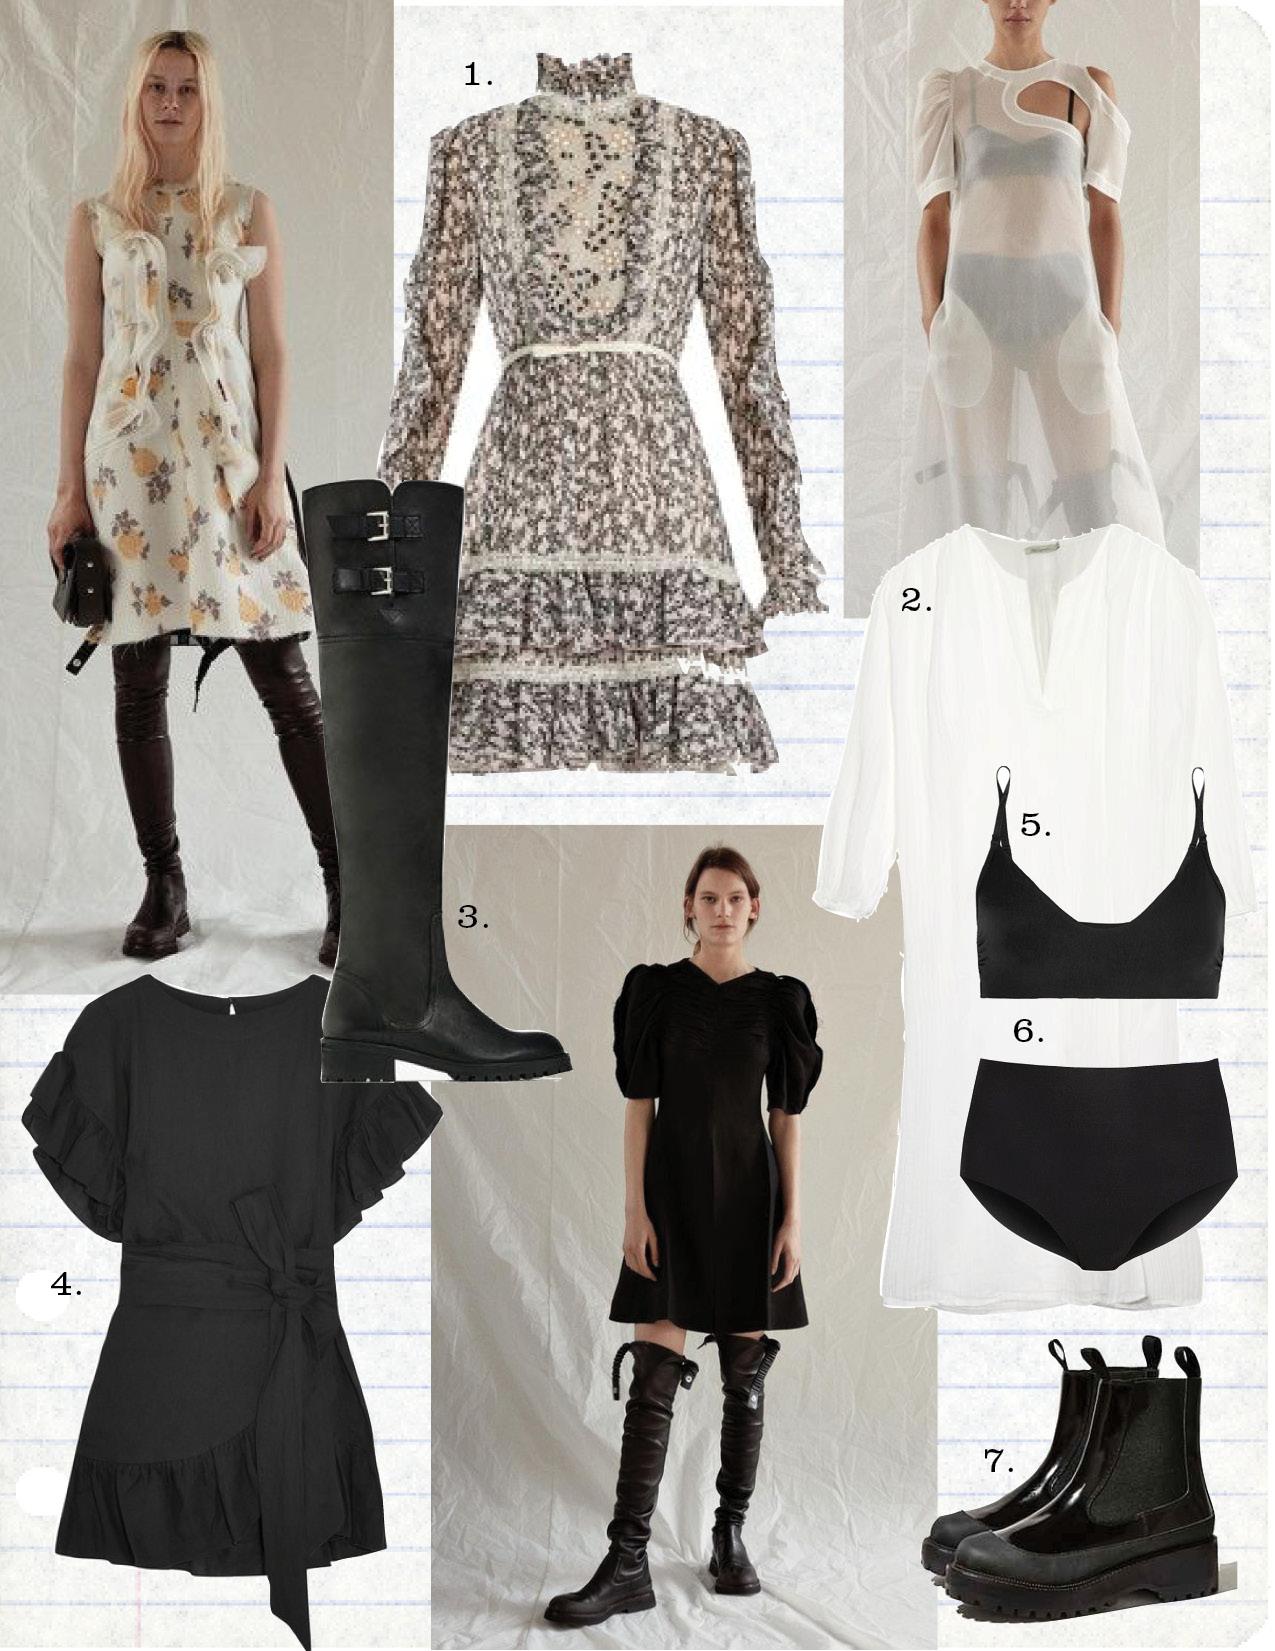 1. giambattista valli floral-print ruffles silk-georgette dress, $2028,  matchesfashion.com  2. mes demoiselles white cotton dress, $183,  matchesfashion.com  3. zara over-the-knee flat leather boots, $69,  zara.com  4. etoile isabel marant delicia ruffle mini dress, $430,  net-a-porter.com  5. commando black stretch bra, $60,  net-a-porter.com  6. commando high-rise stretch black briefs, $34,  net-a-porter.com  7. jeffrey cambell for Uo orbital chelsea boot, $165,  urbanoutfitters.com